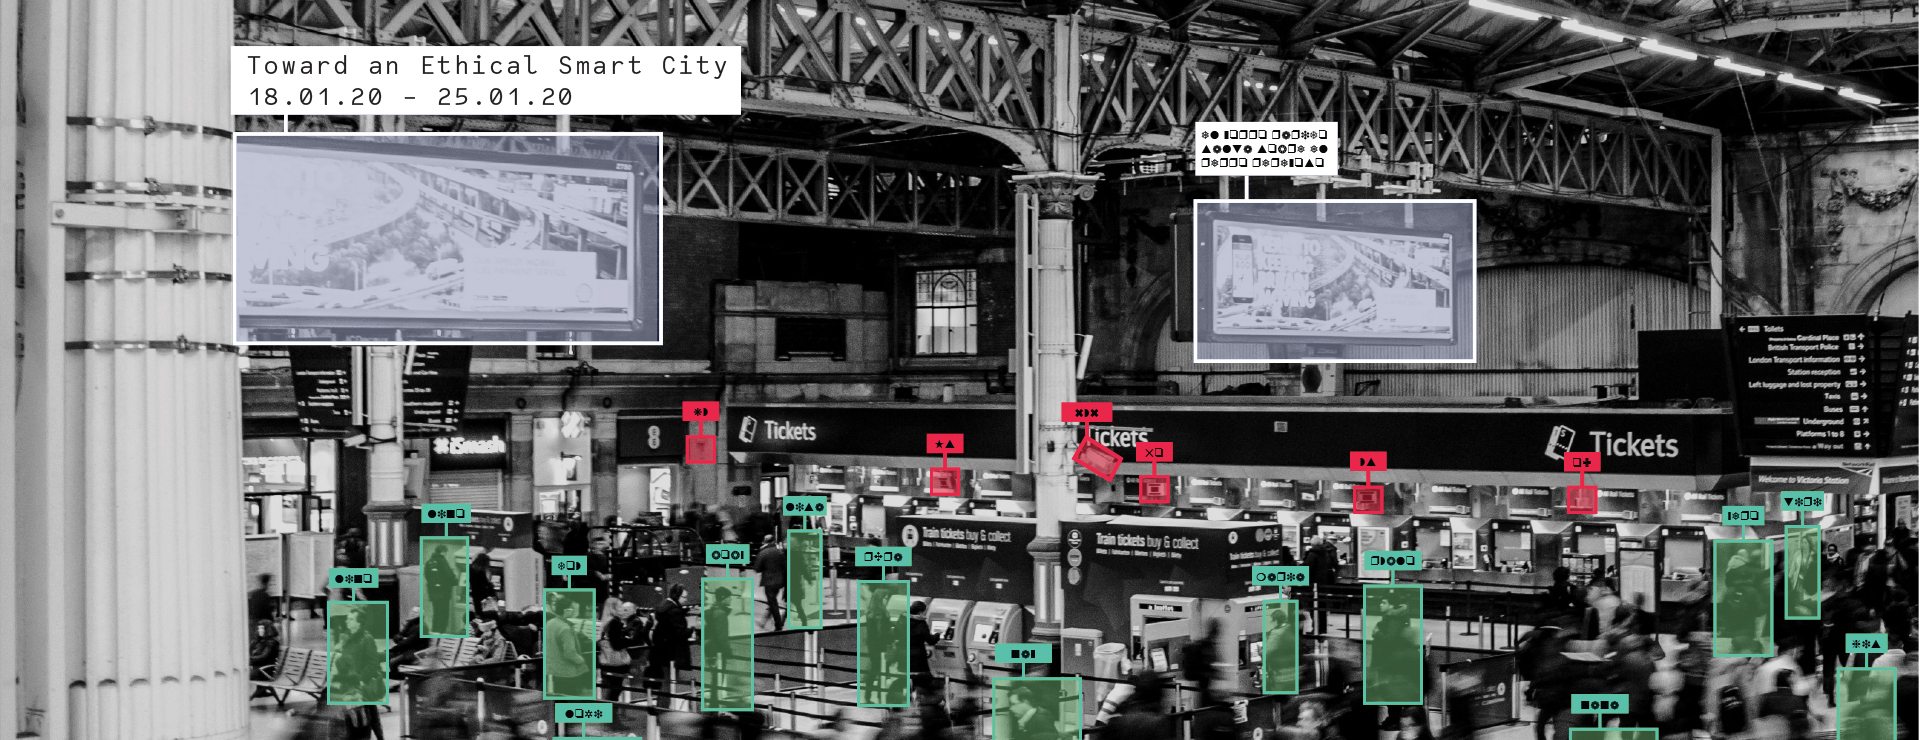 Toward an Ethical Smart City